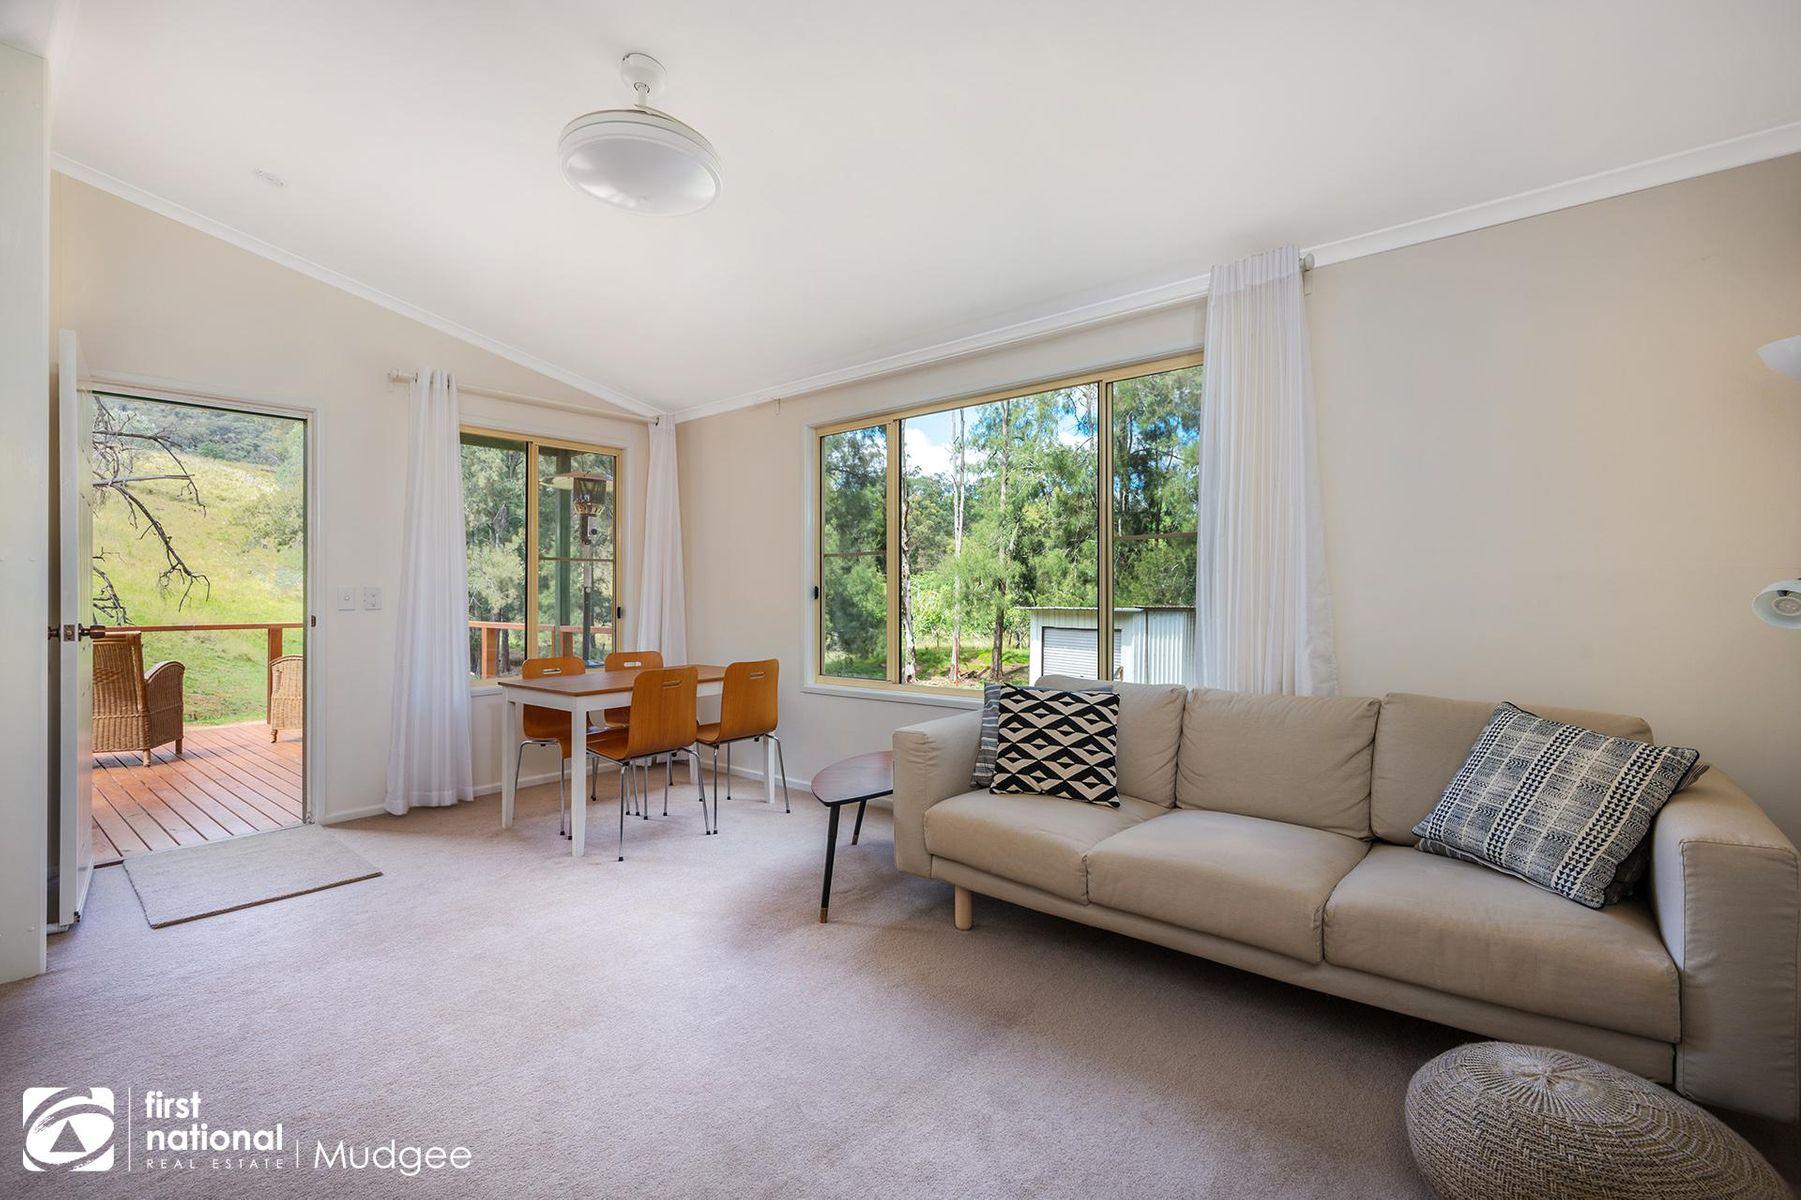 567 Riverlea Road, Mudgee, NSW 2850